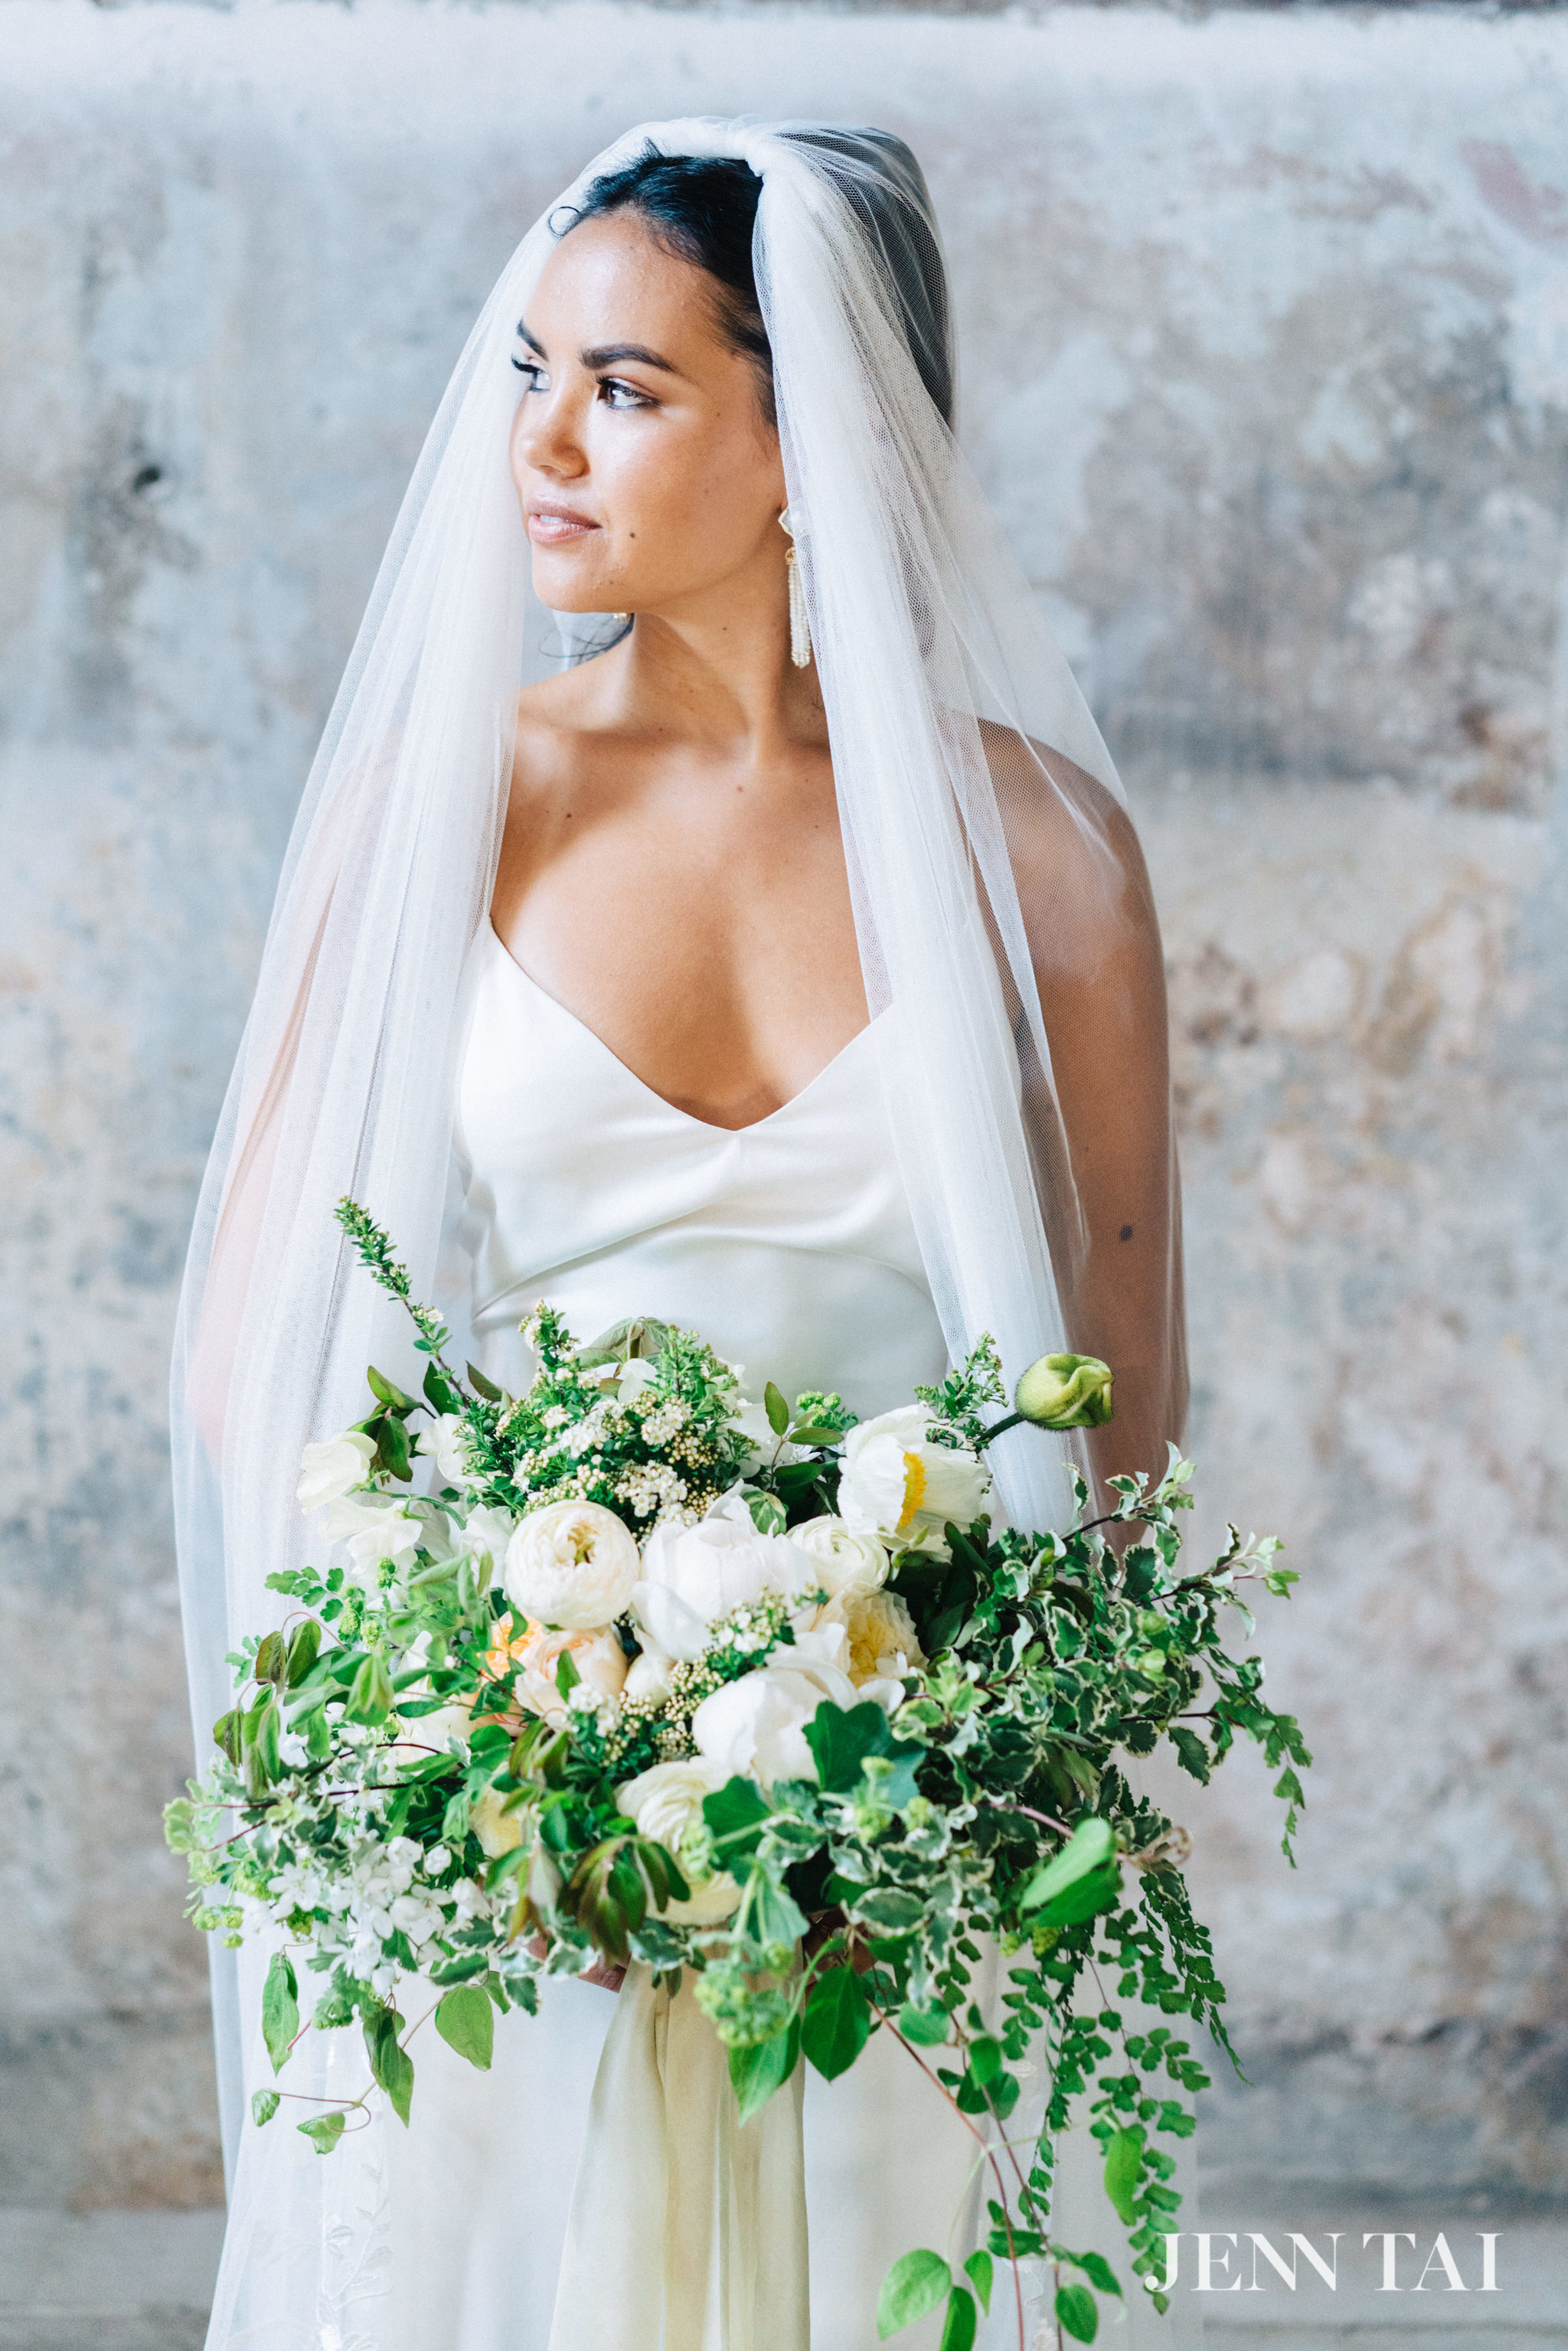 seattle-wedding-photographer-jenn-tai-max-gill-workshop-seattle-maura7677.JPG